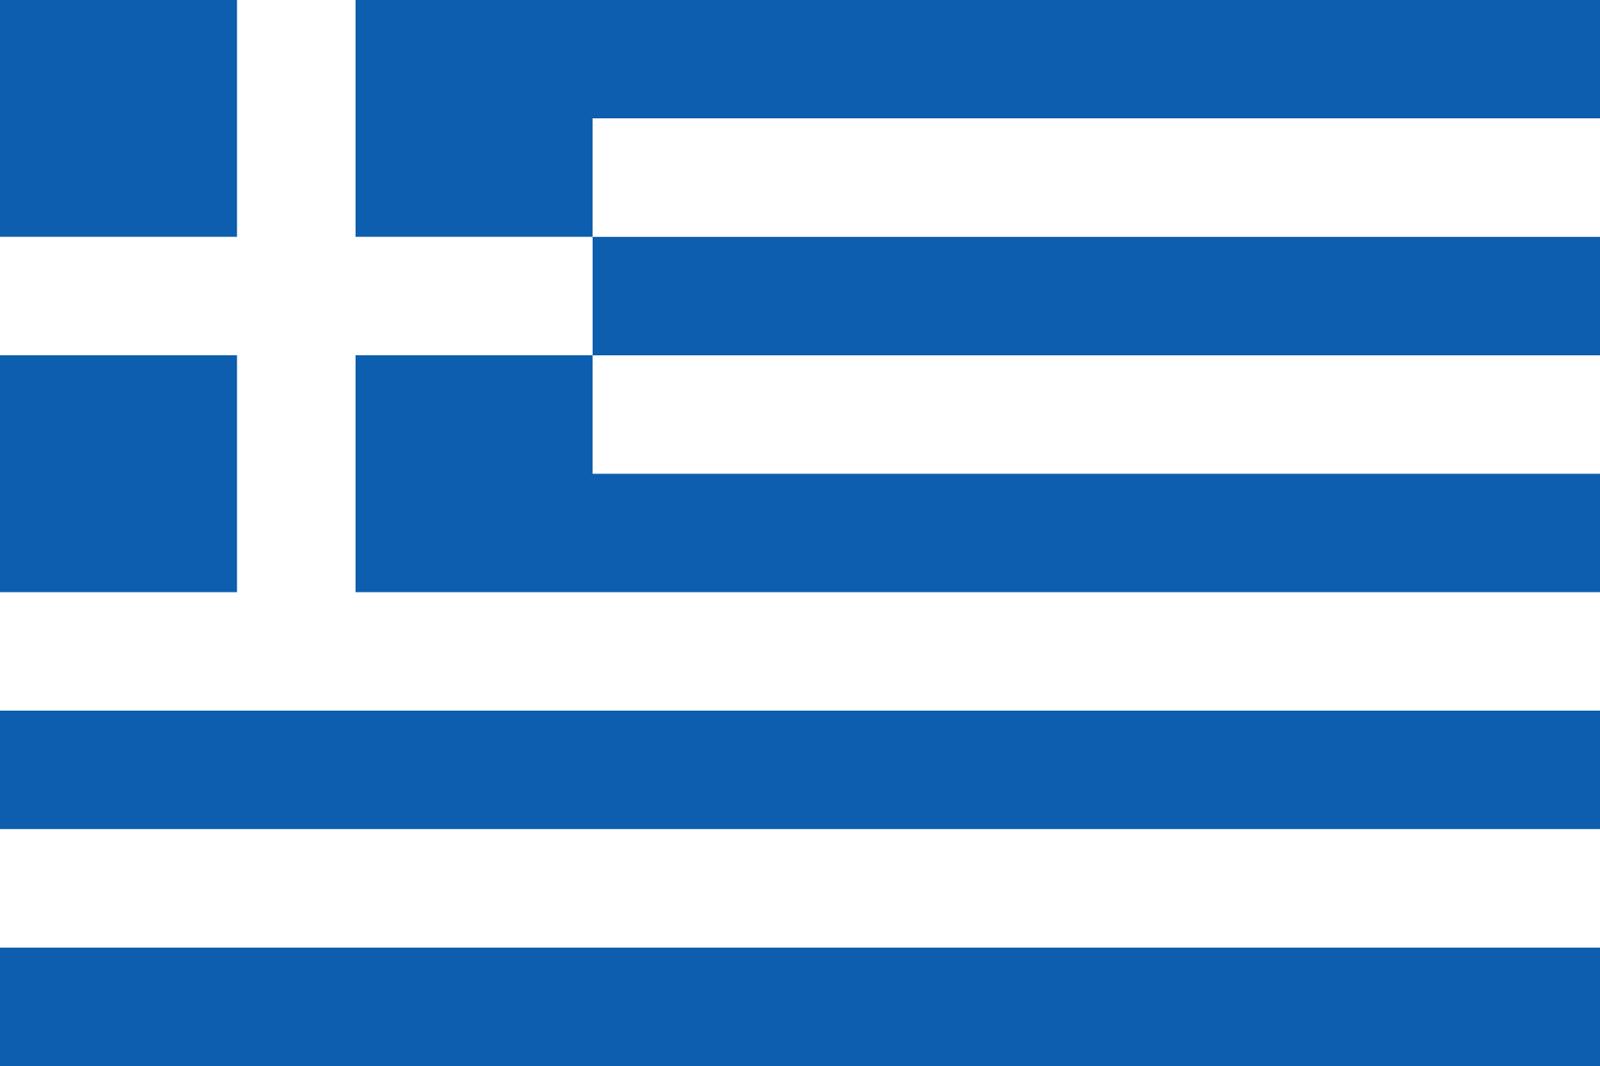 http://carbrandsincurrentproduction.blogspot.com.es/search/label/Greece